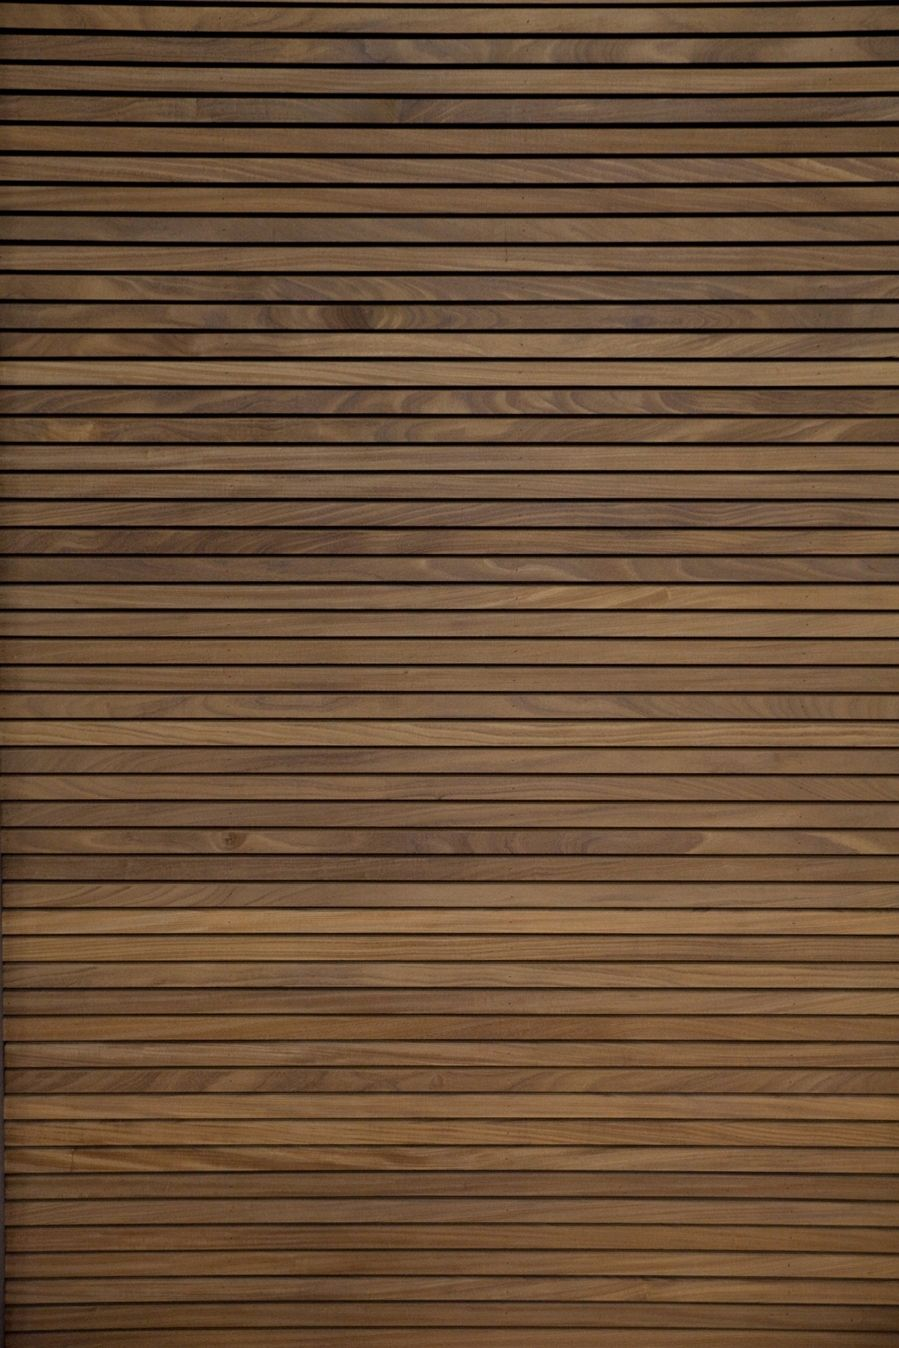 Gevelbekleding Afrormosia Parallello 22 31 Patterns Textures Pinterest Woods Walls And